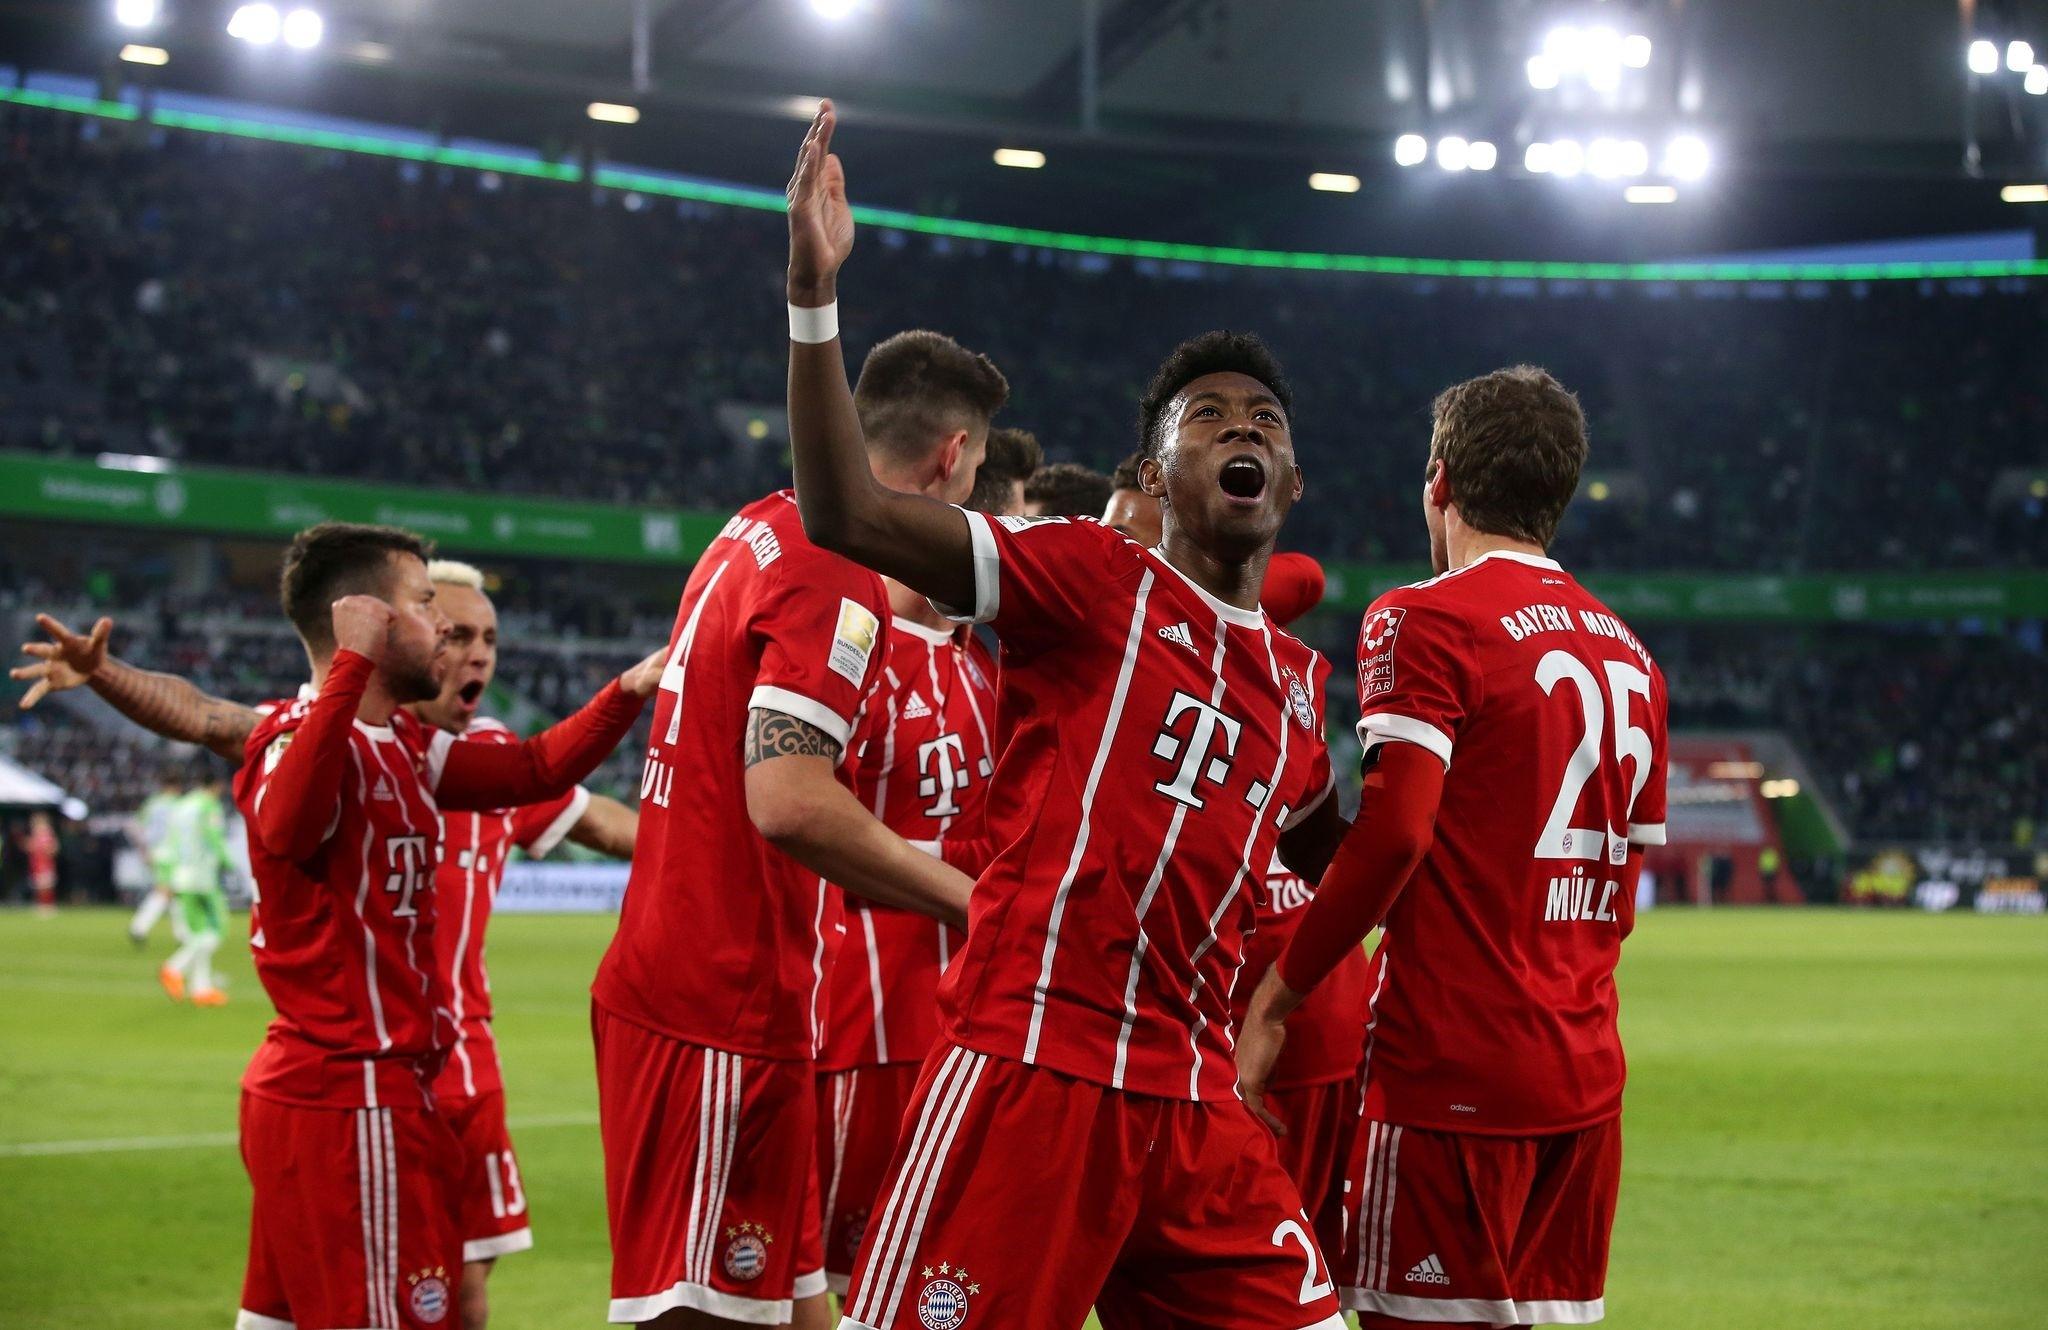 Bayern Munich's Austrian defender David Alaba (C) celebrates with teammates after they scored during the Bundesliga football match between VfL Wolfsburg and FC Bayern Munich on February 17, 2018. (AFP Photo)